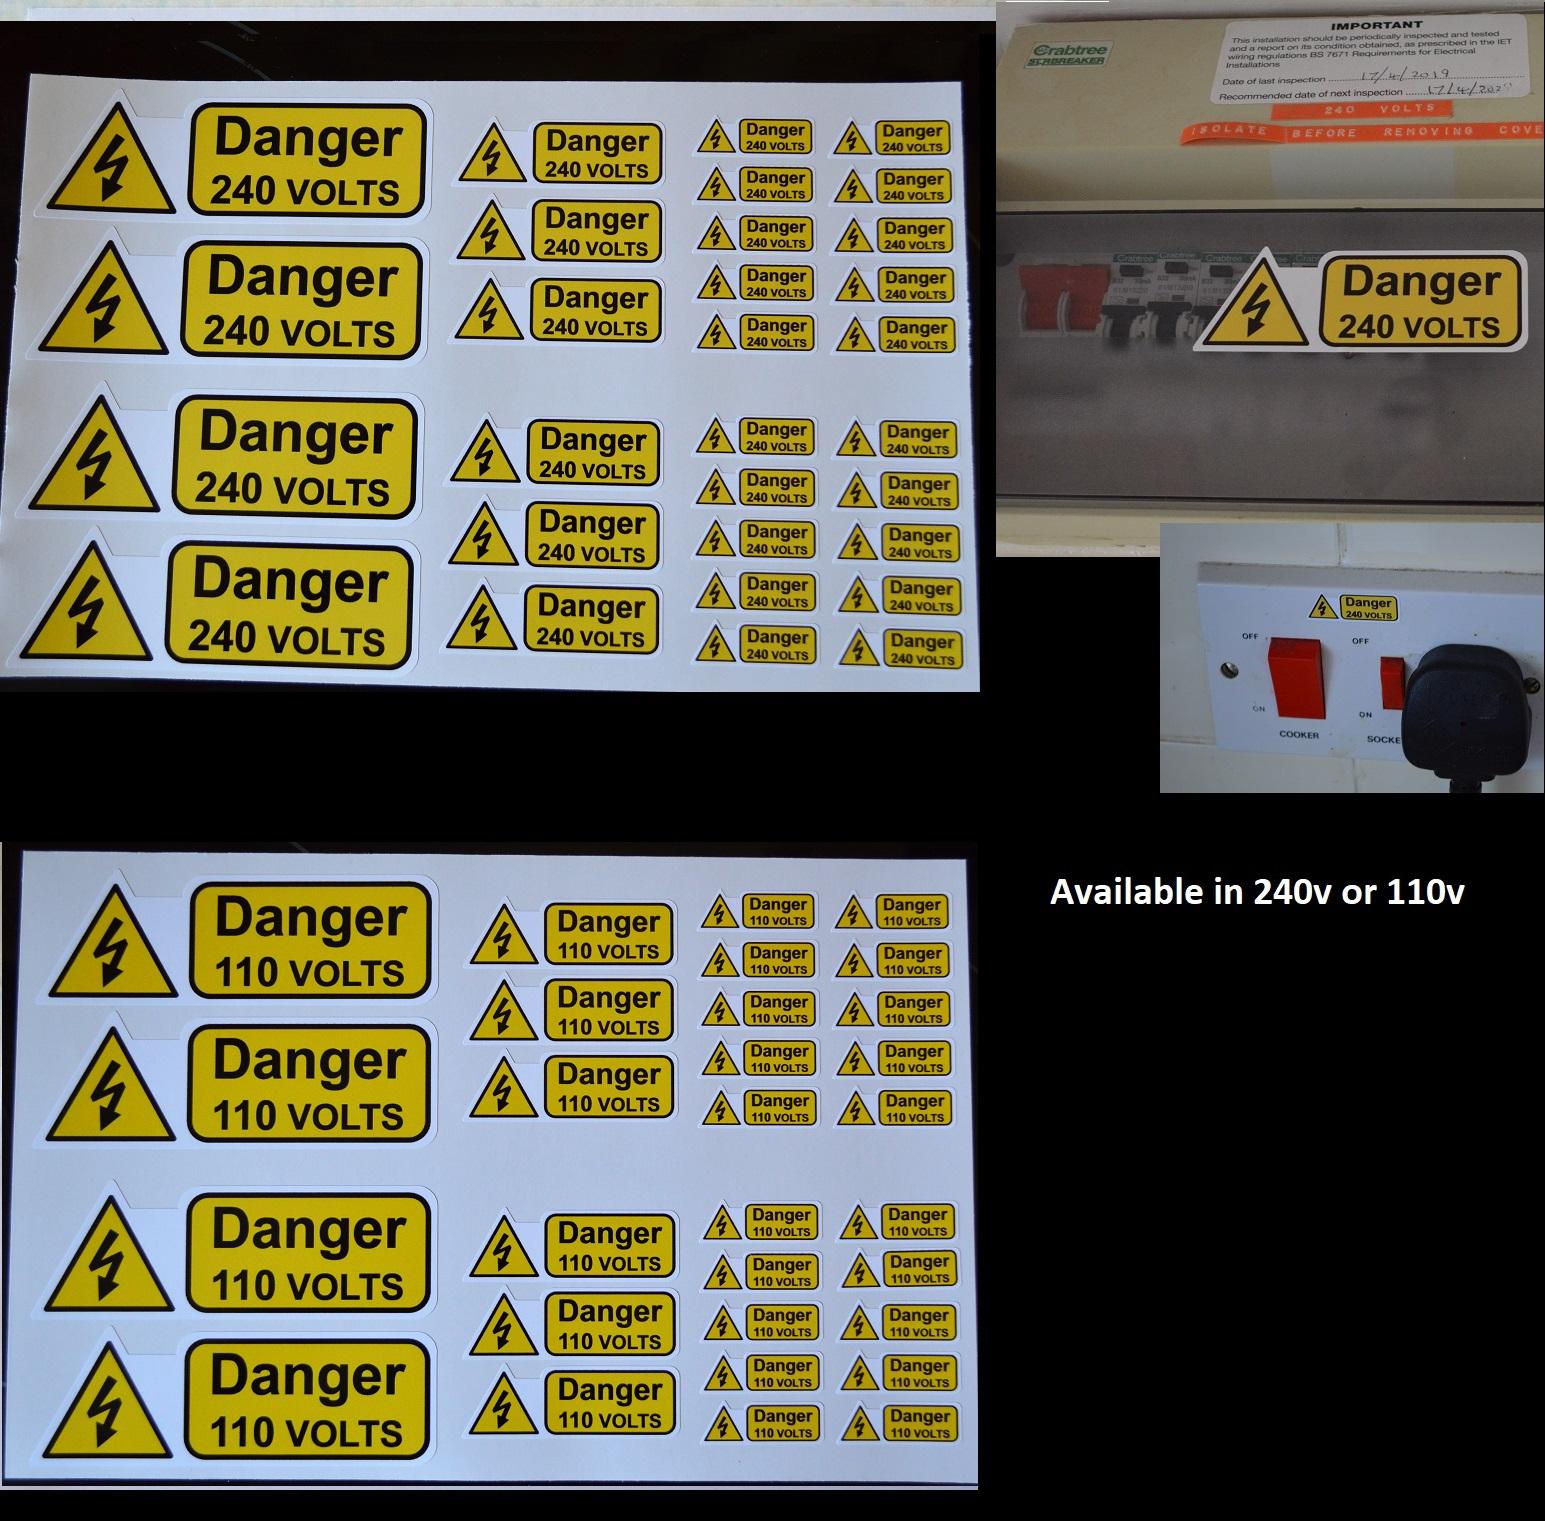 hight resolution of danger 240v or 110v solid vinyl stickers for fuse boxes etc